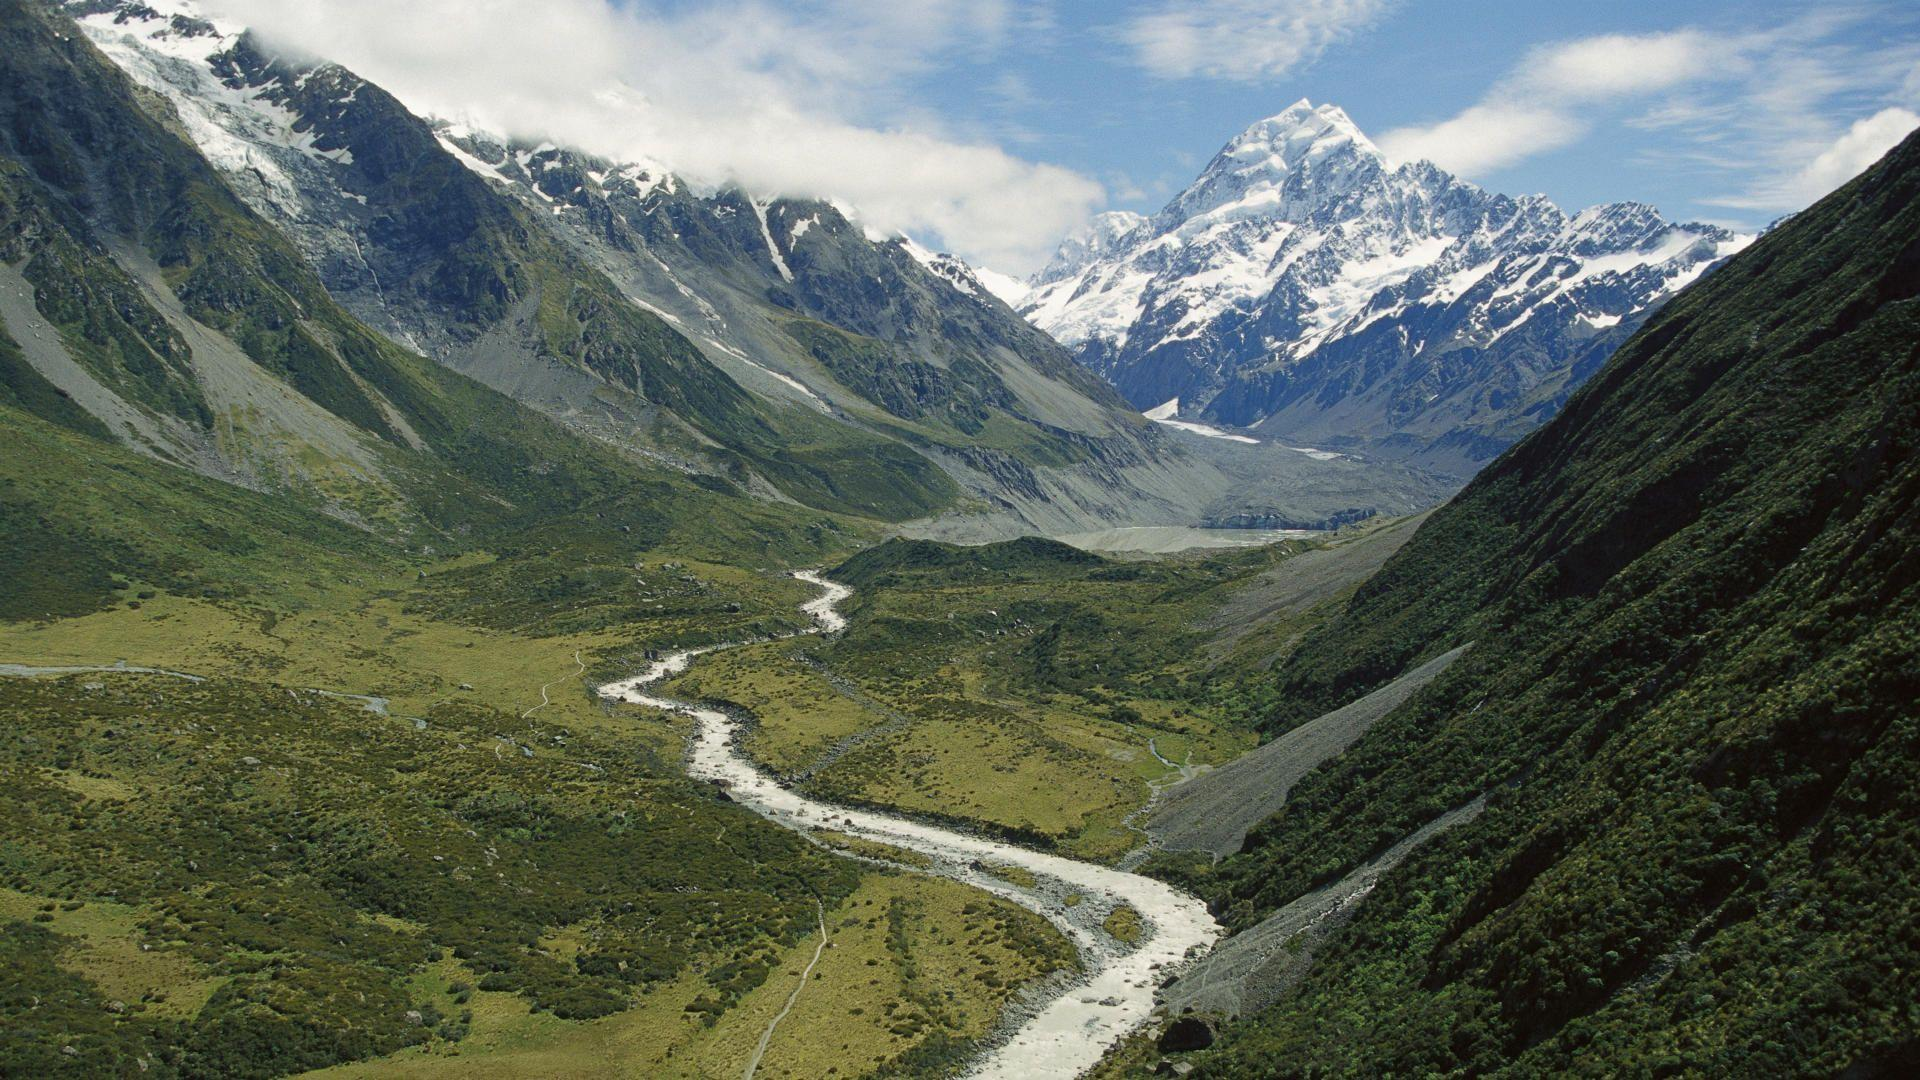 Pelaku Penembakan New Zealand Wallpaper: New Zealand Desktop Wallpapers